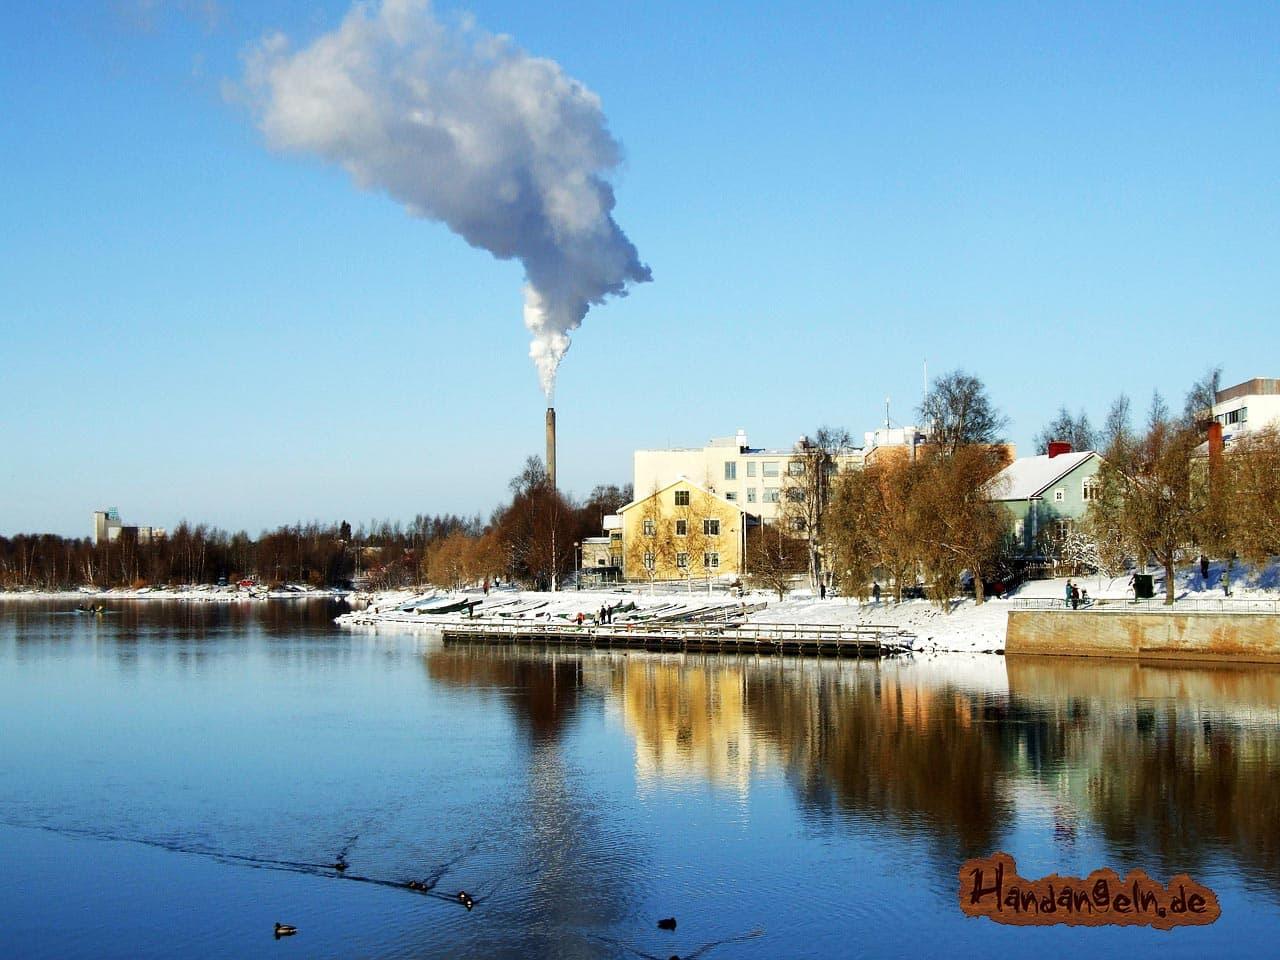 Finnland Oulo See Kraftwerk warmes Wasser Aalangeln im Winter